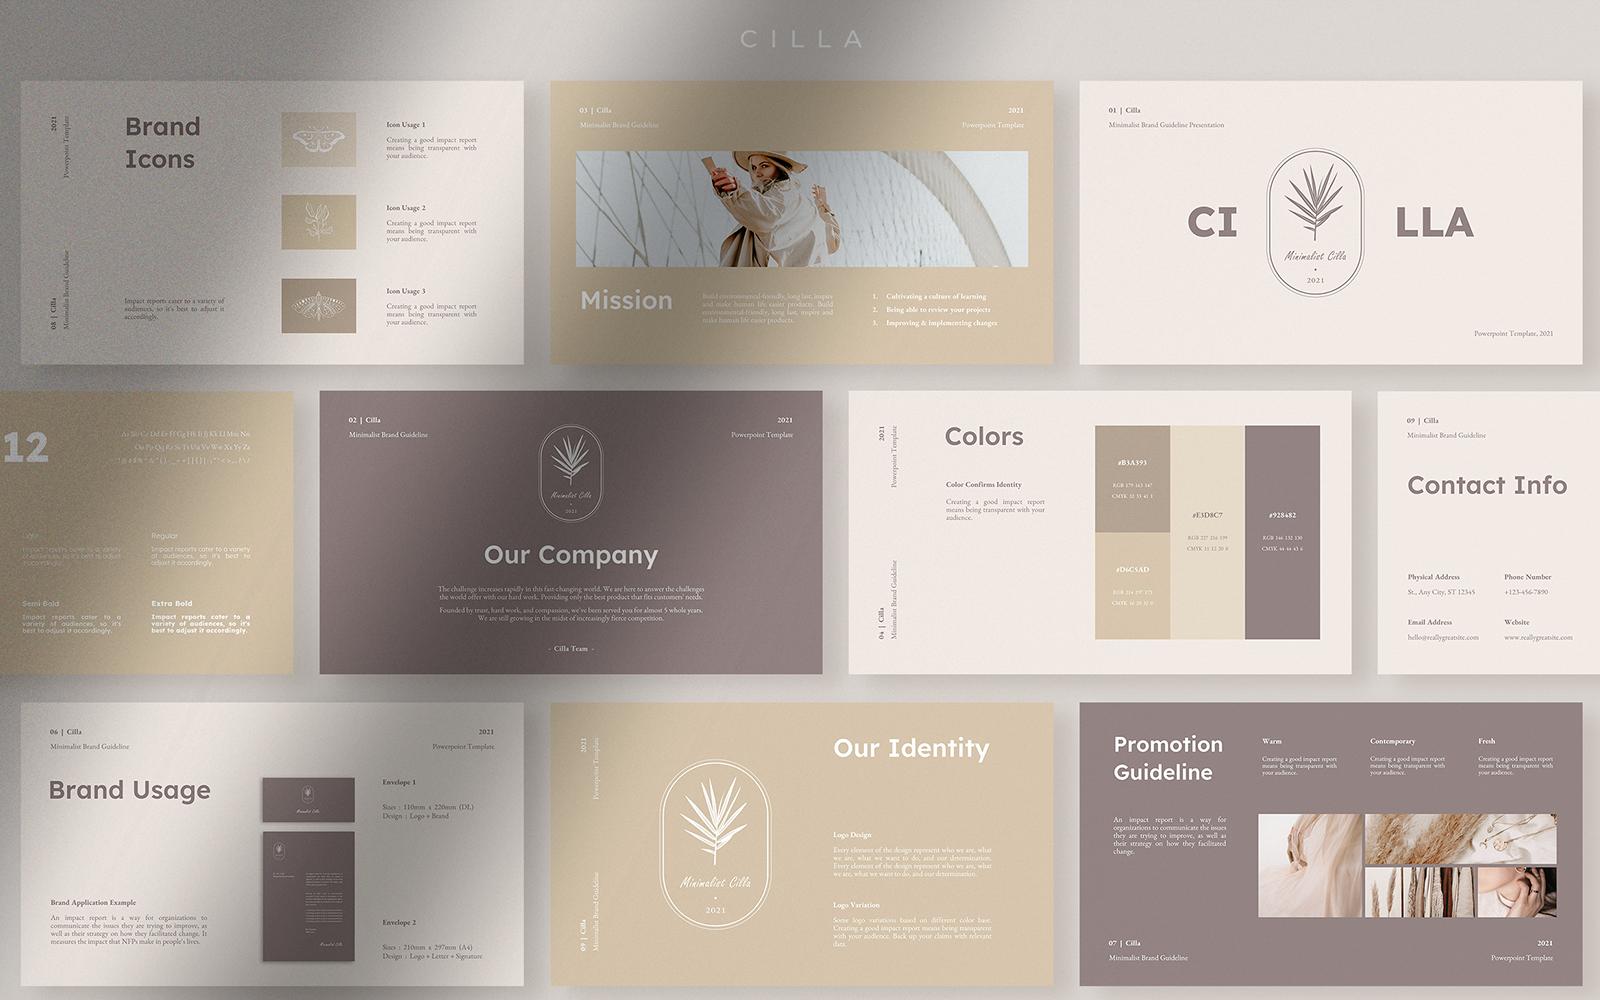 Cilla Minimalist Brand Guideline PowerPoint Template